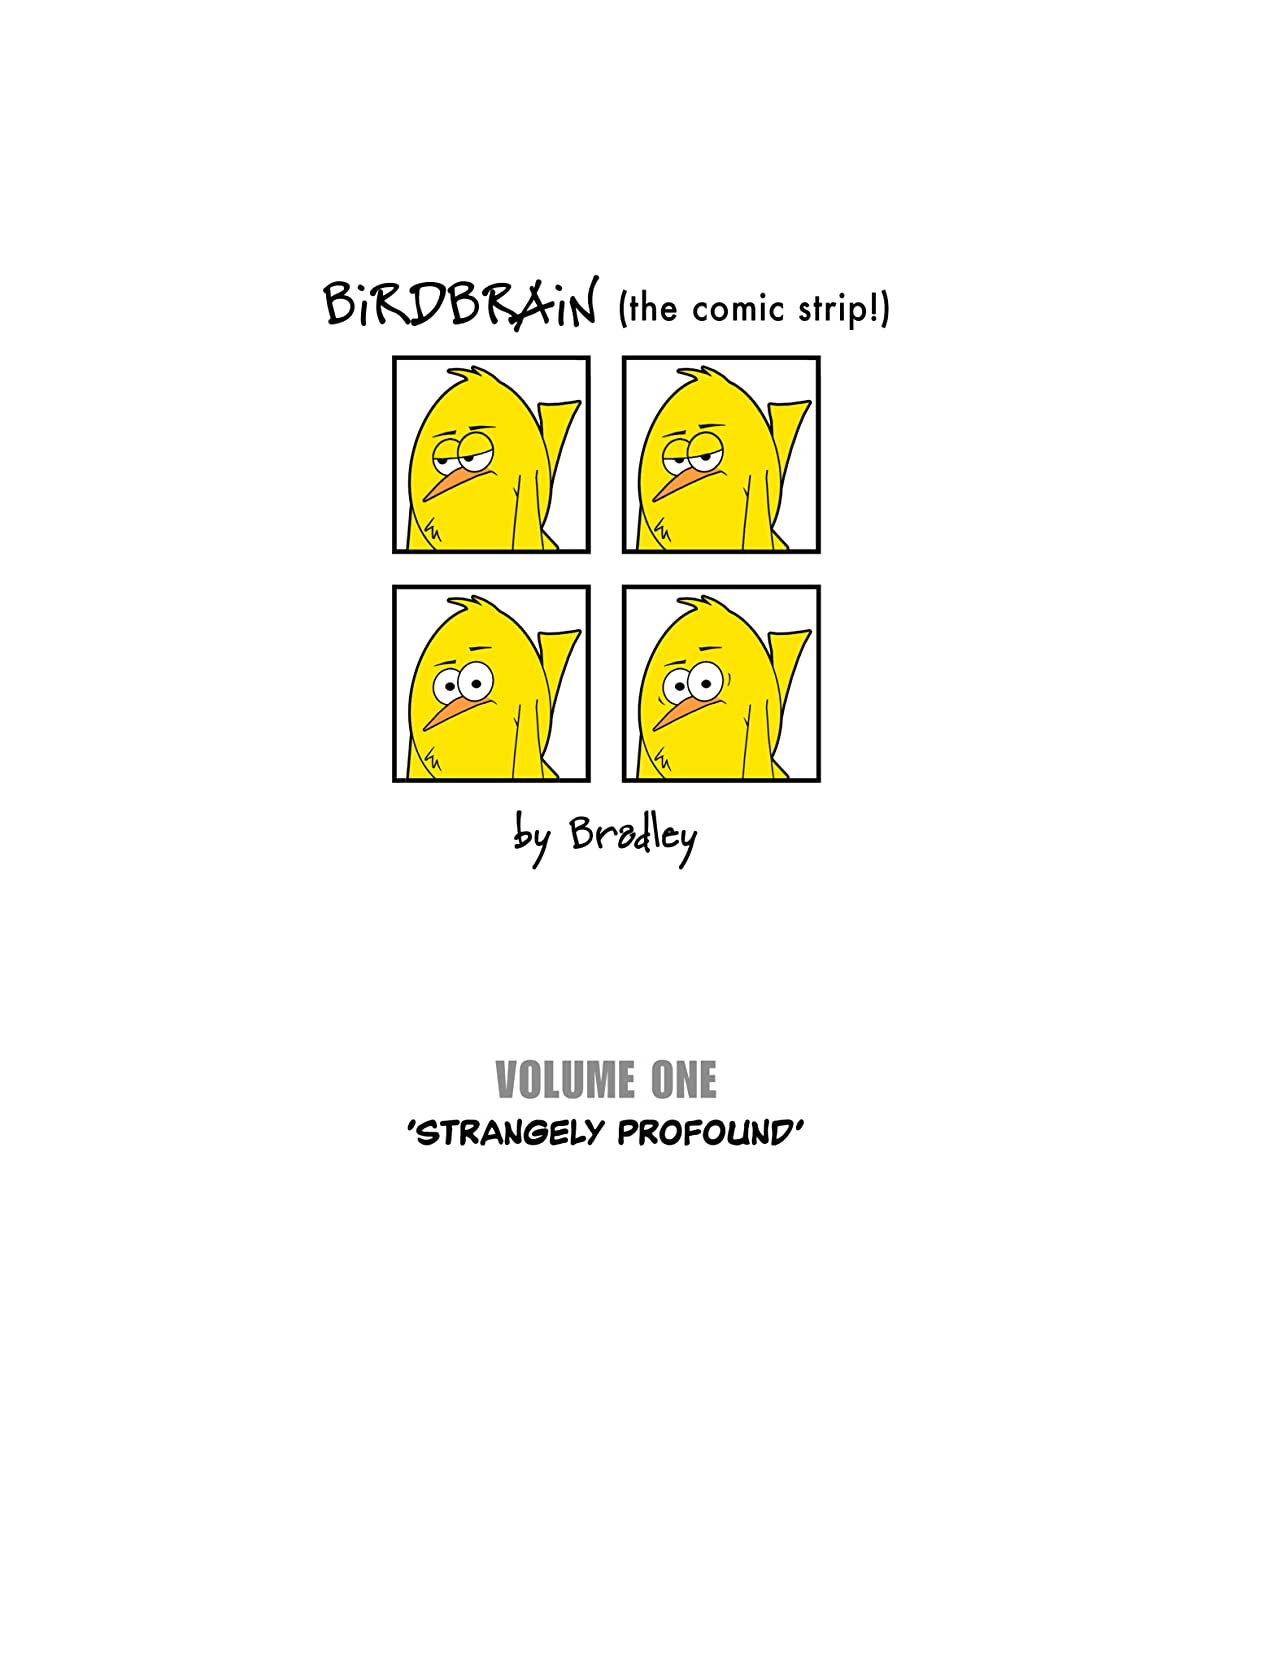 BiRDBRAiN (the comic strip!) Vol. 1: Strangely Profound